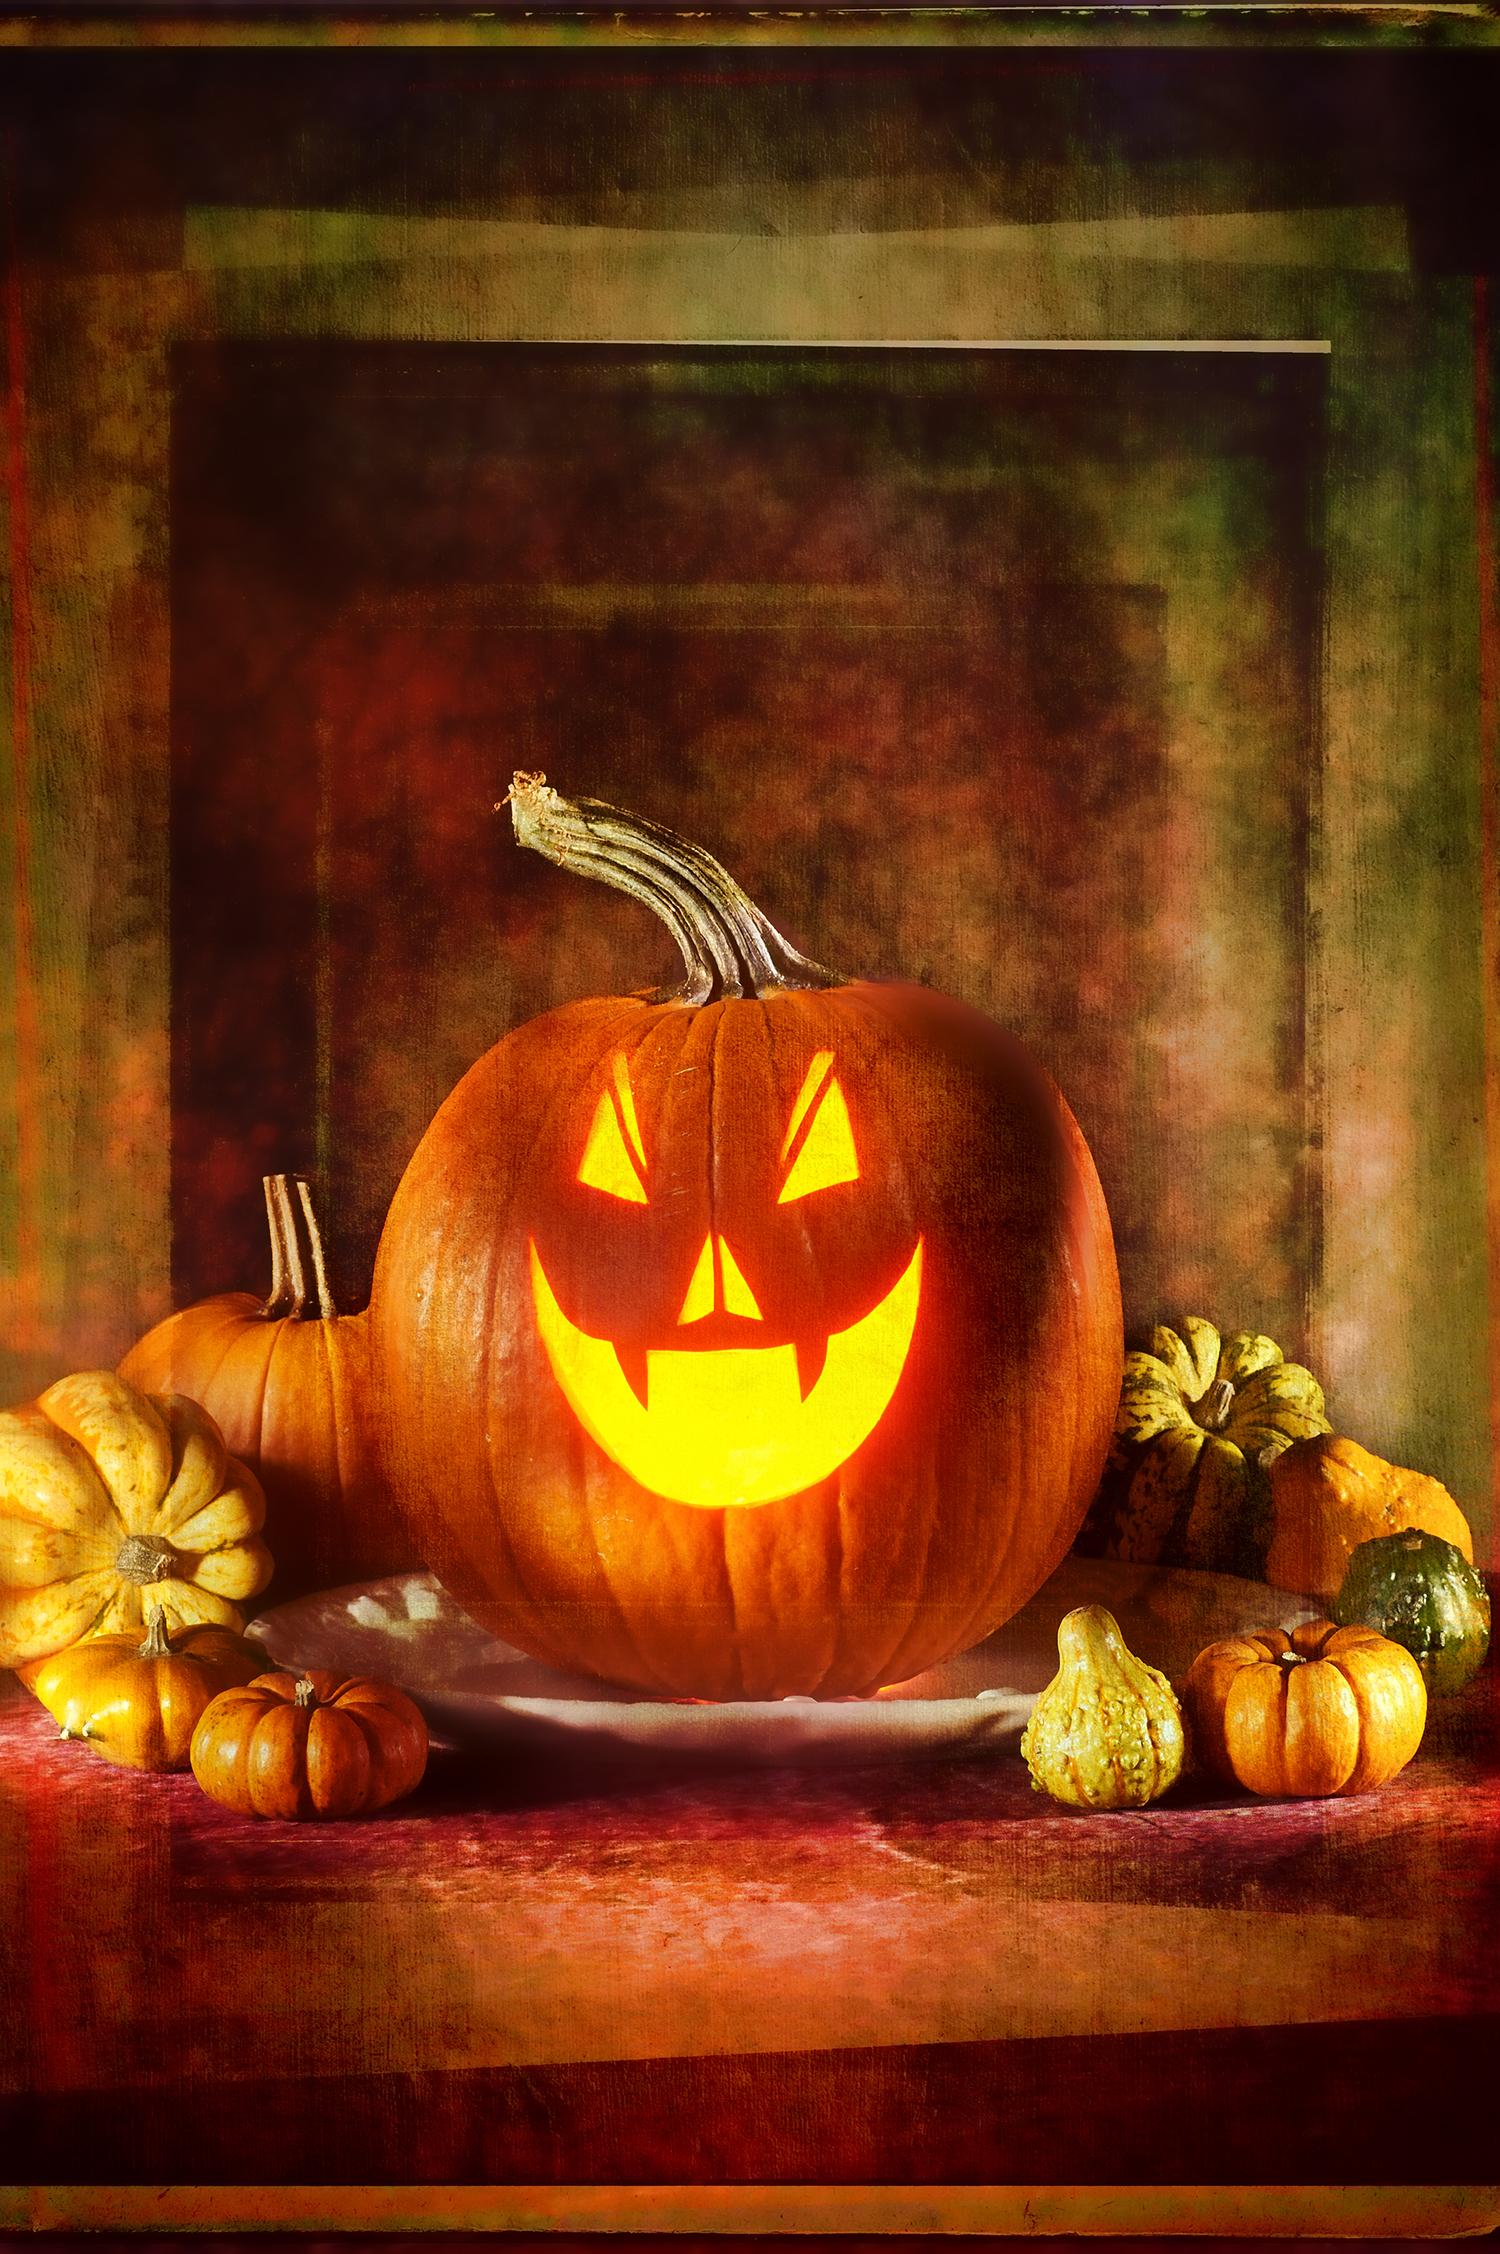 Pumpkin 1 photomorphis.jpg